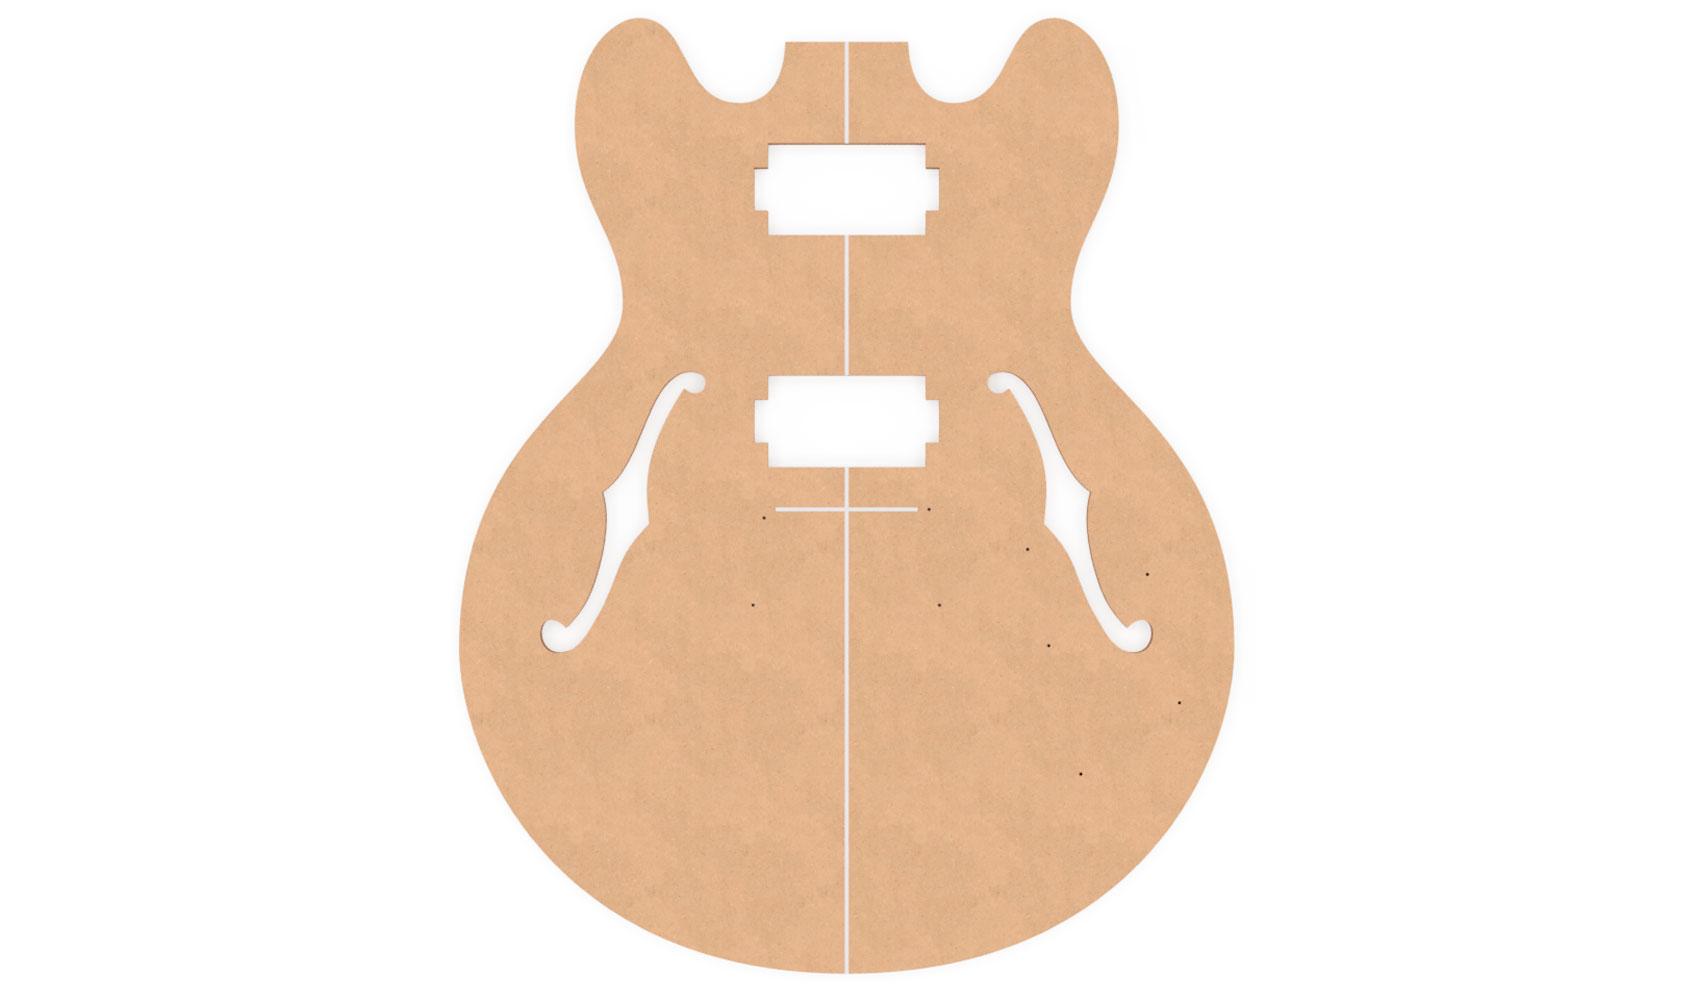 Gibson ES-339 Router Templates